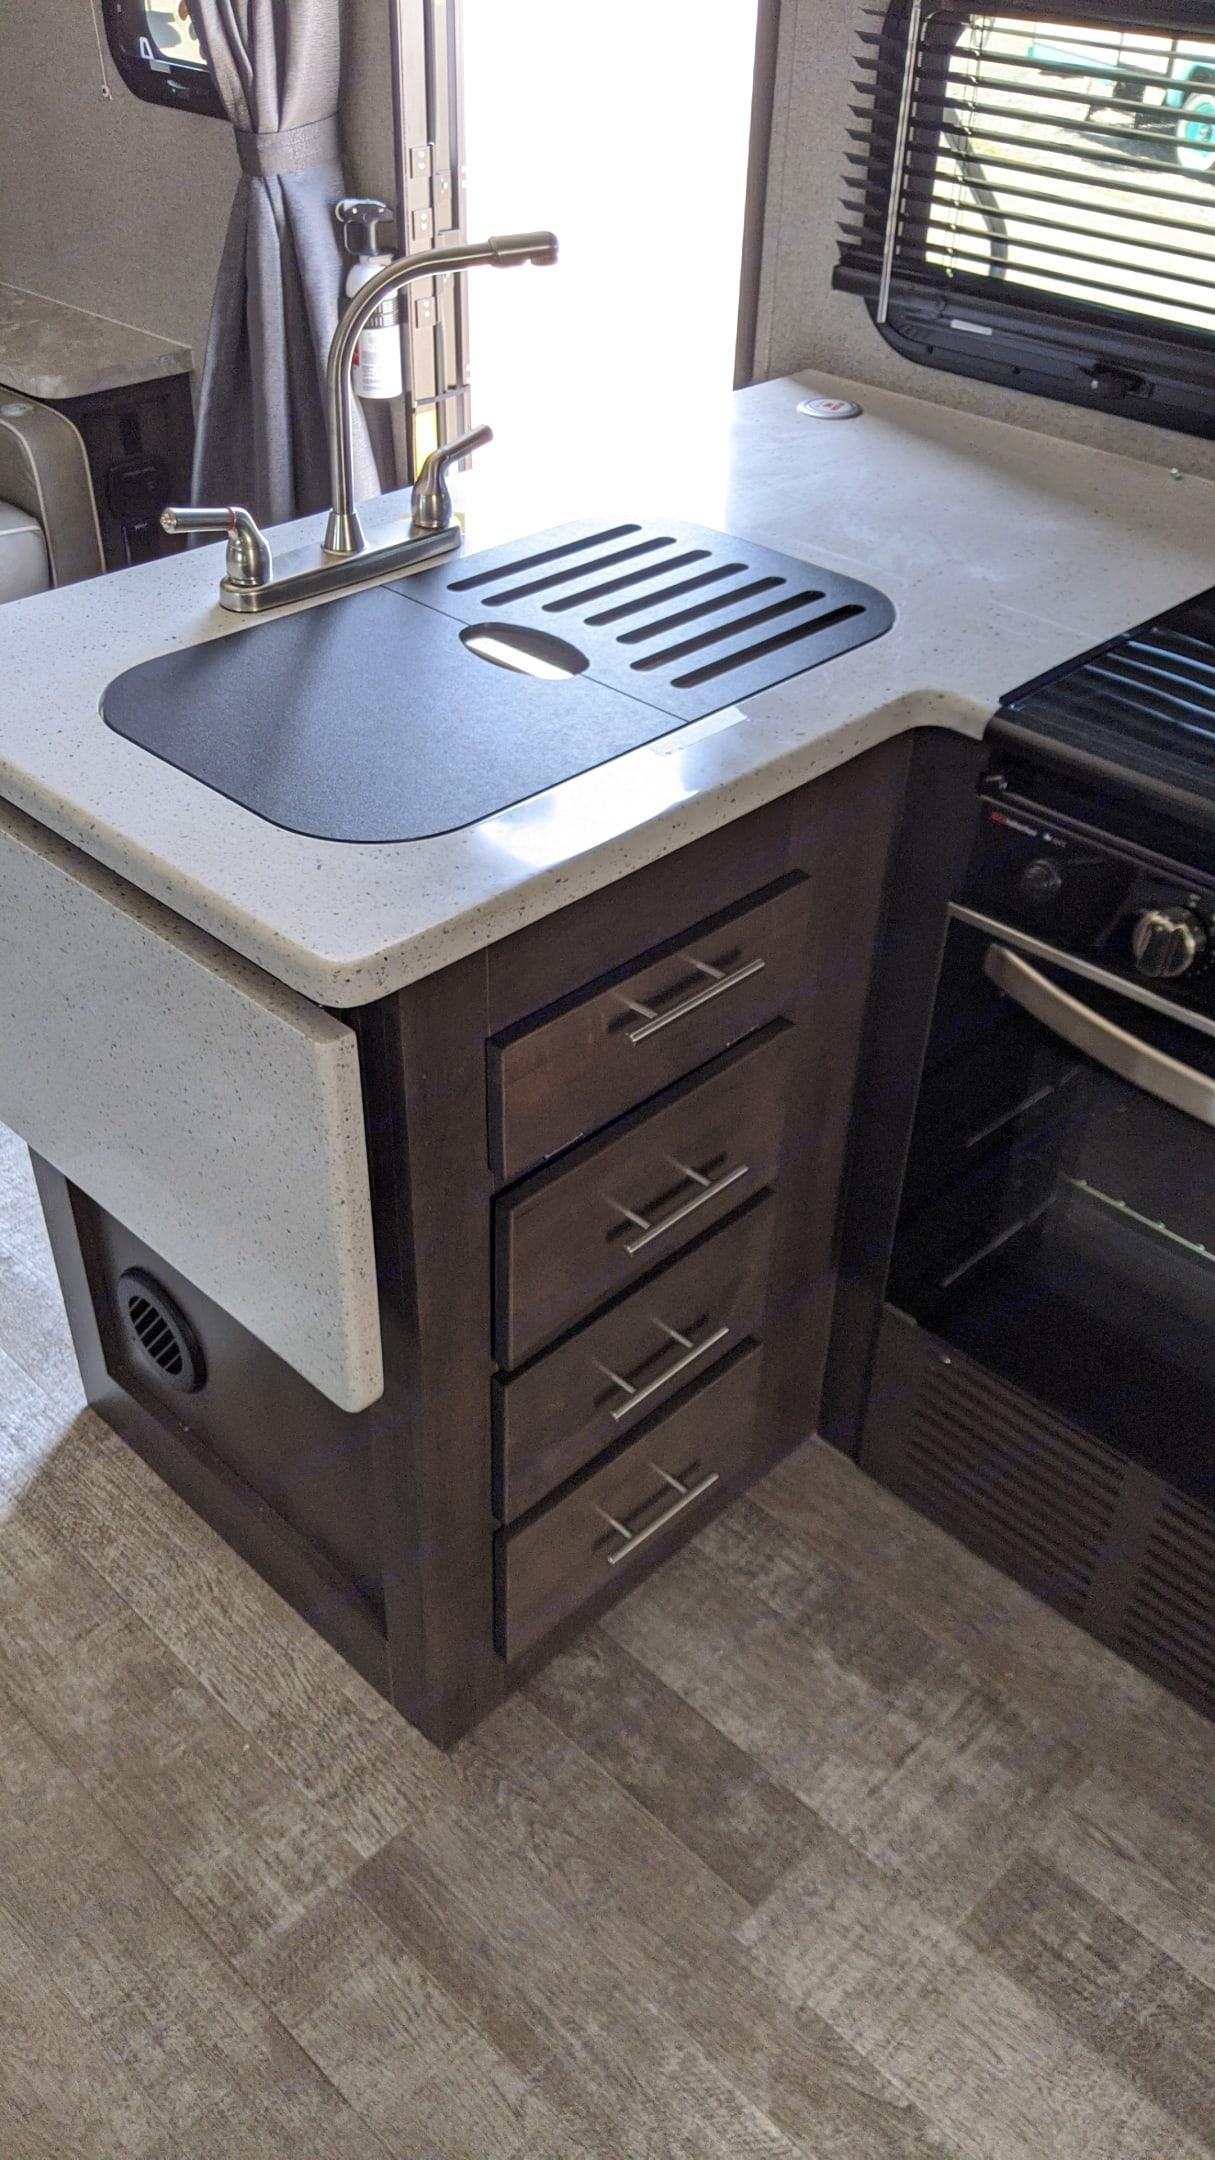 Storage under the sink. Forest River Rockwood Mini Lite 2020